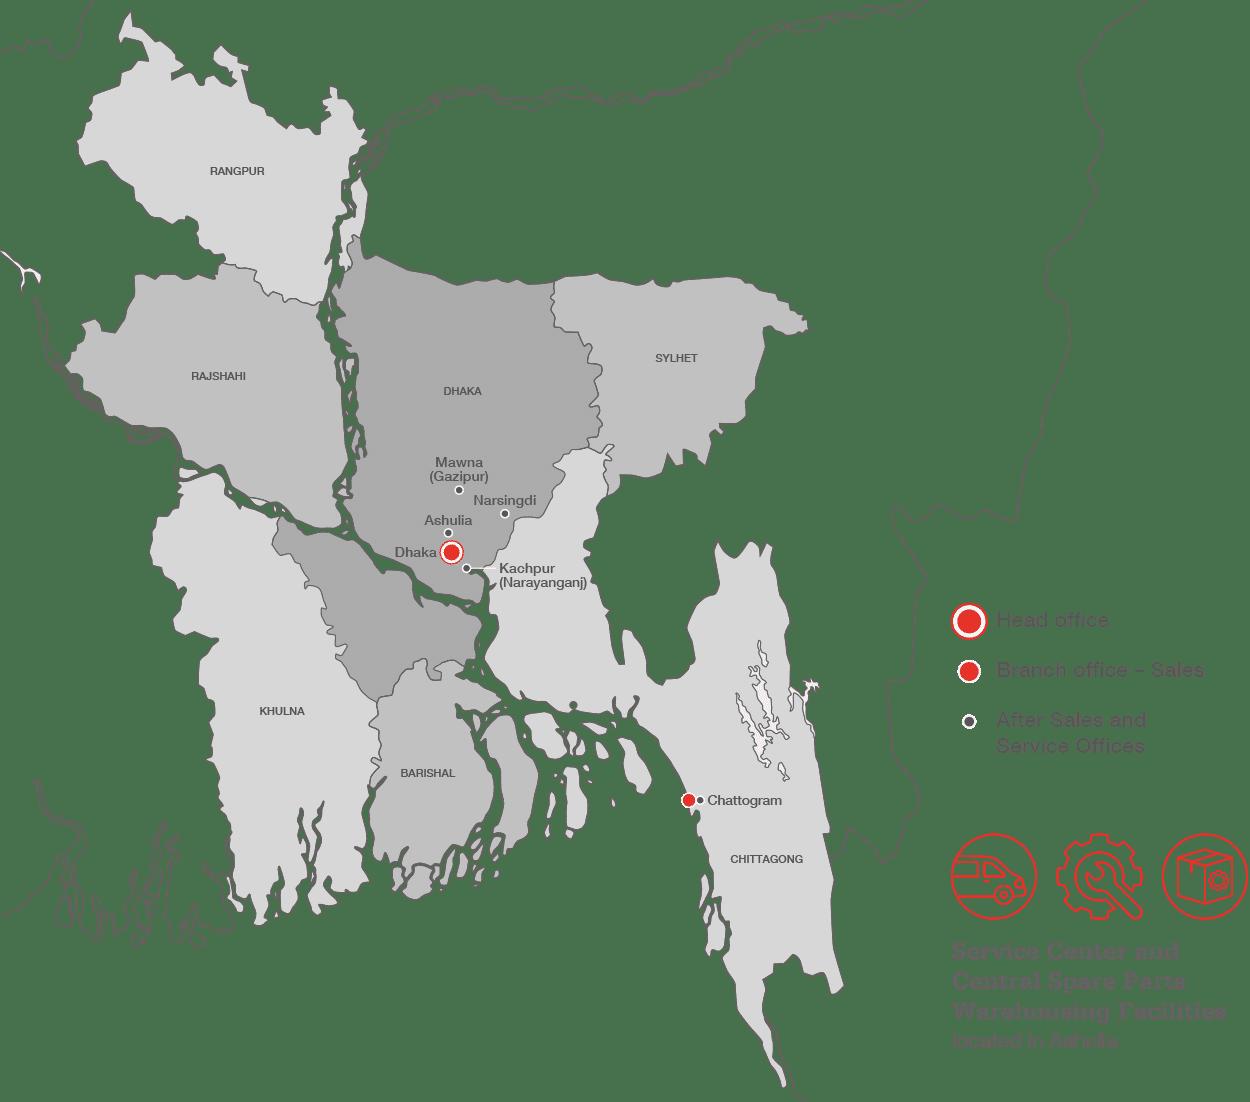 Clarke Energy Regional Facilities in Bangladesh